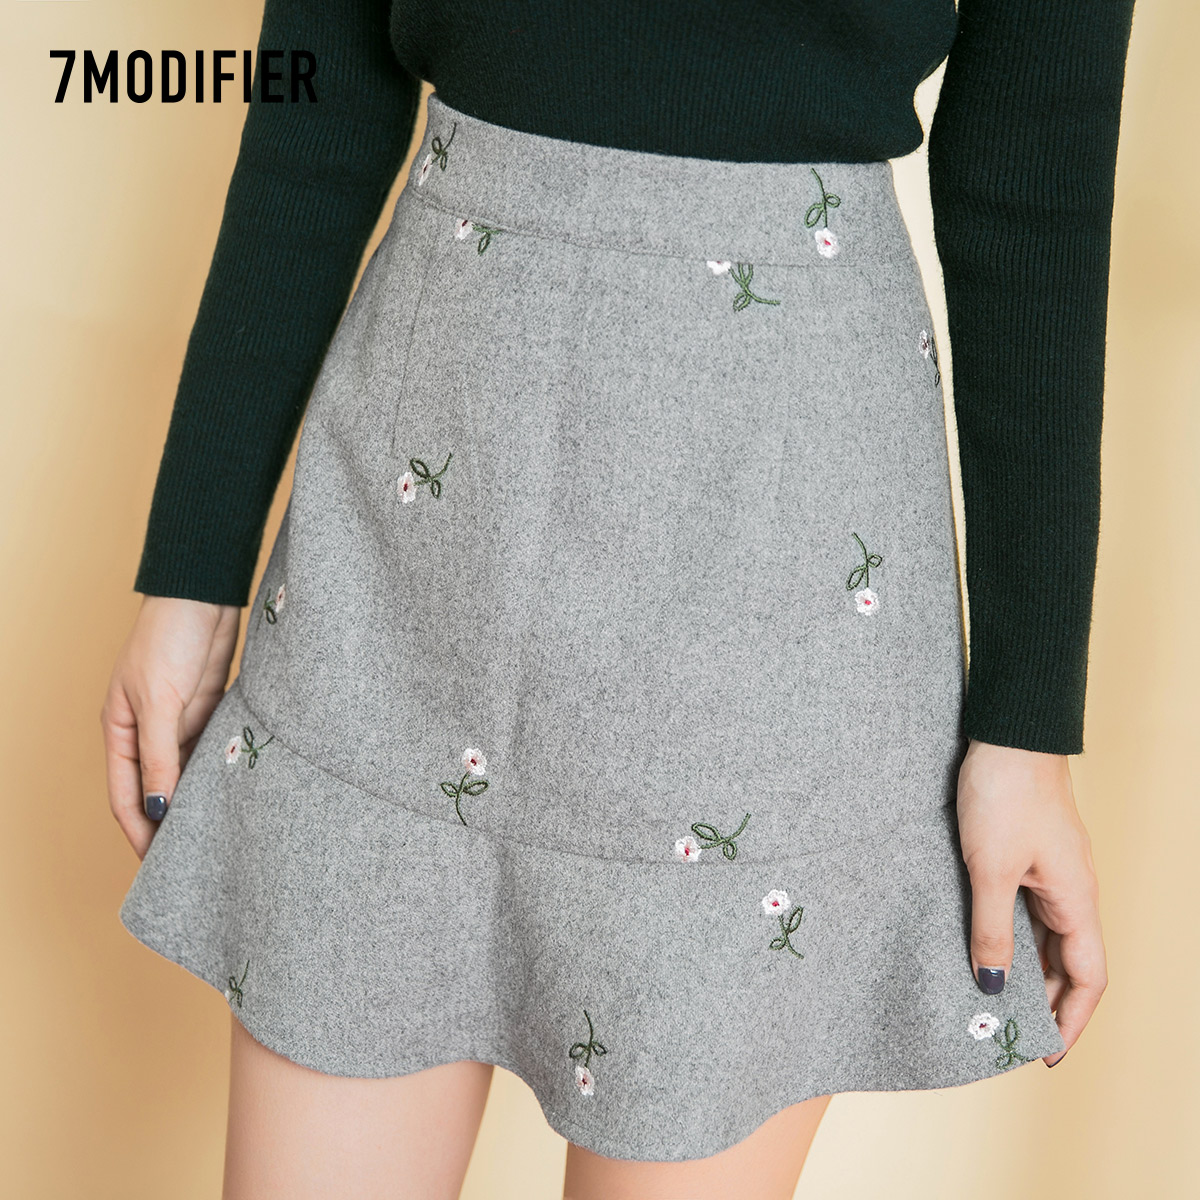 7.Modifier荷叶边裙价格,连衣裙质量评价